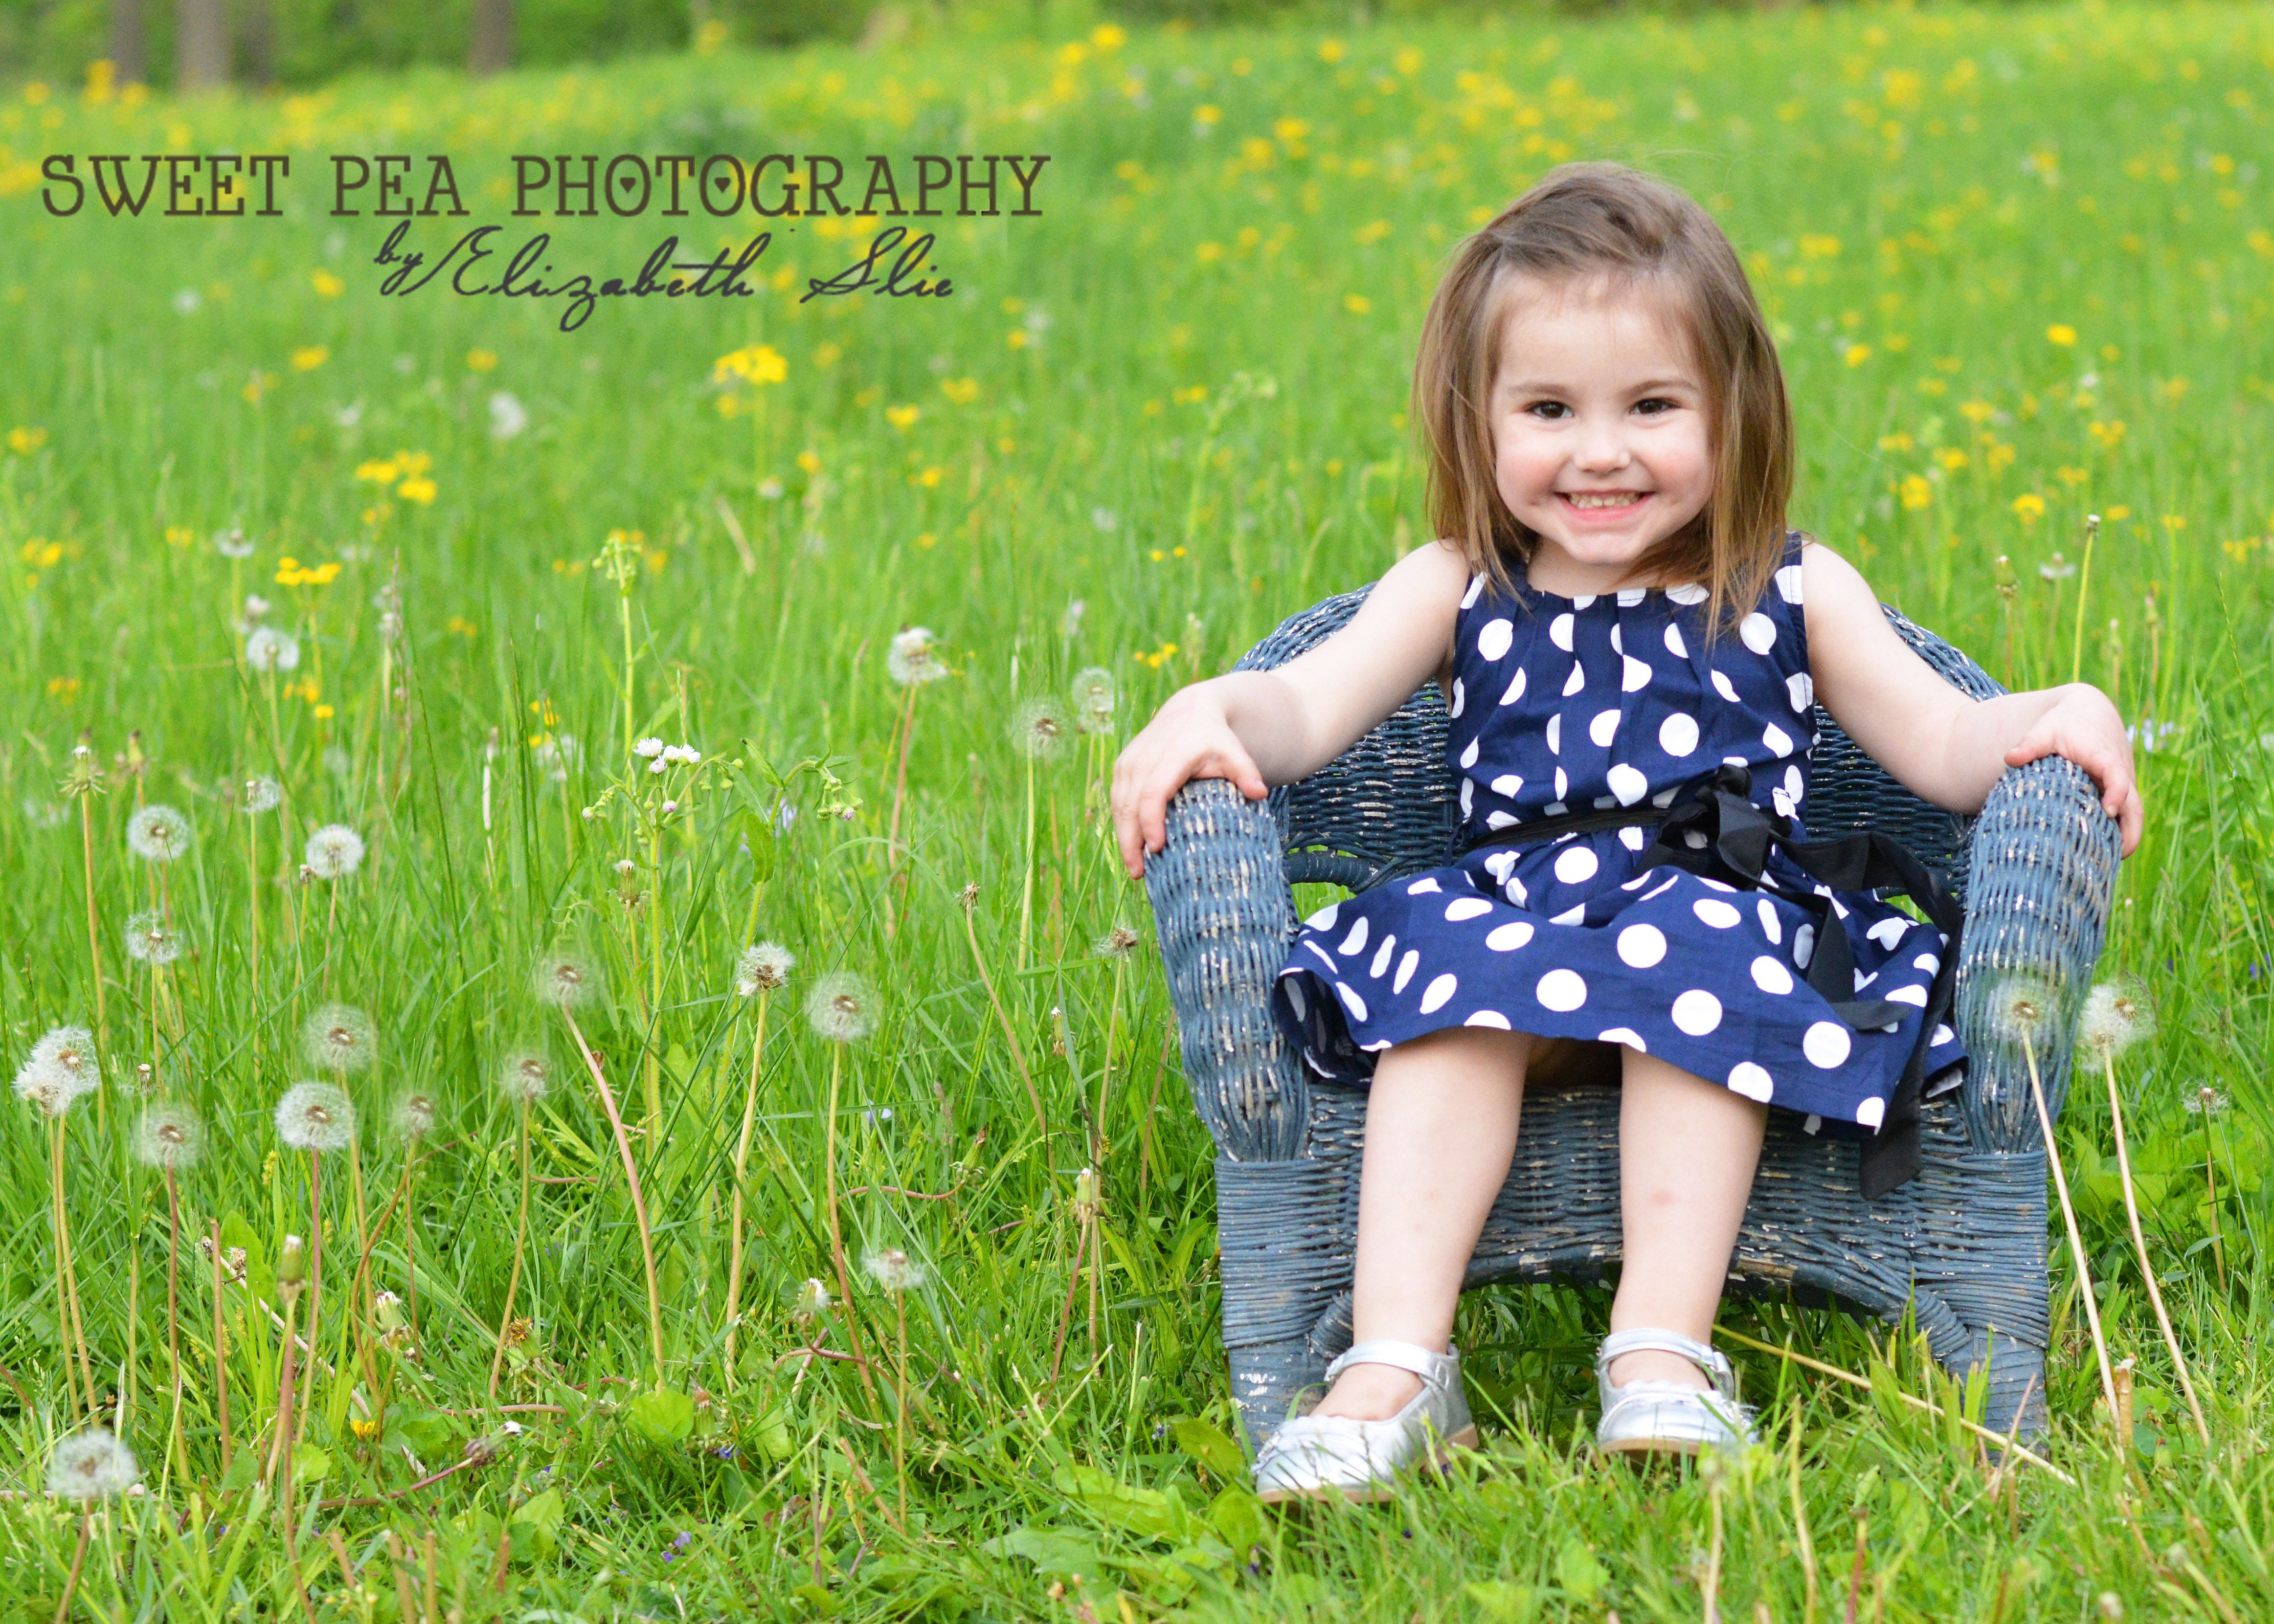 2 Year Old Girl Birthday Photo Shoot Ideas Field